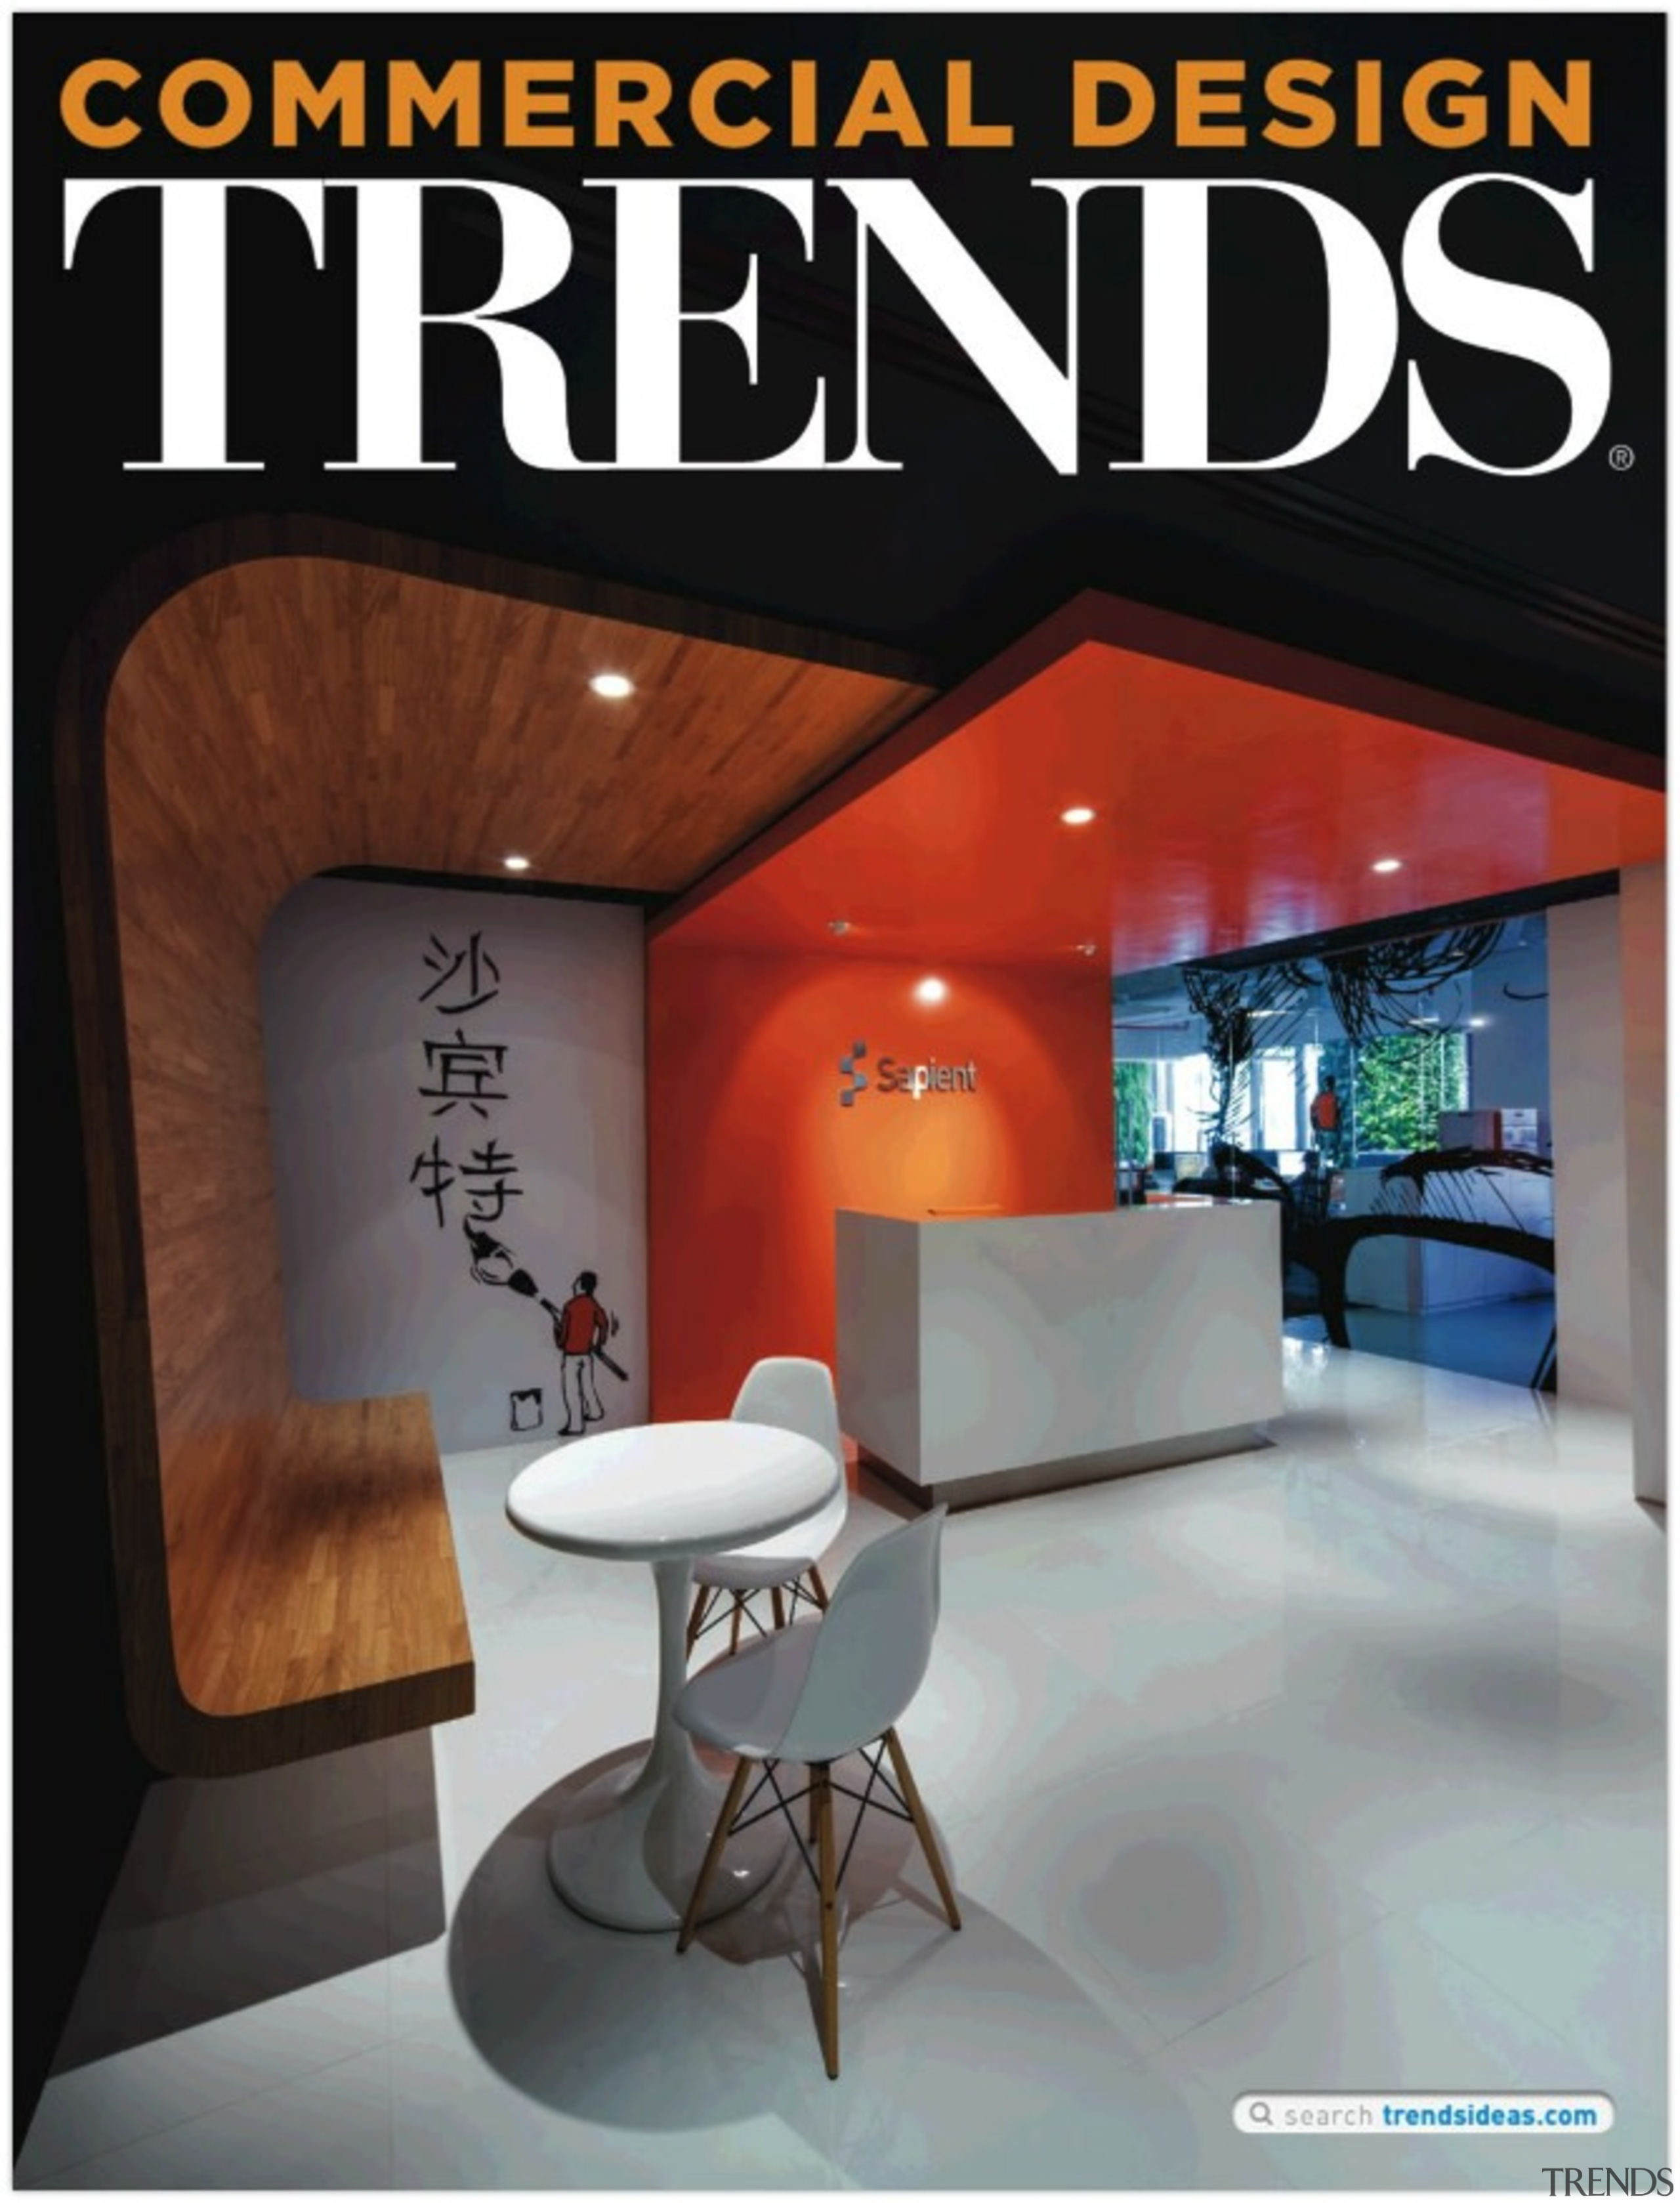 Book Cover Nz2811 furniture, interior design, product design, table, gray, black